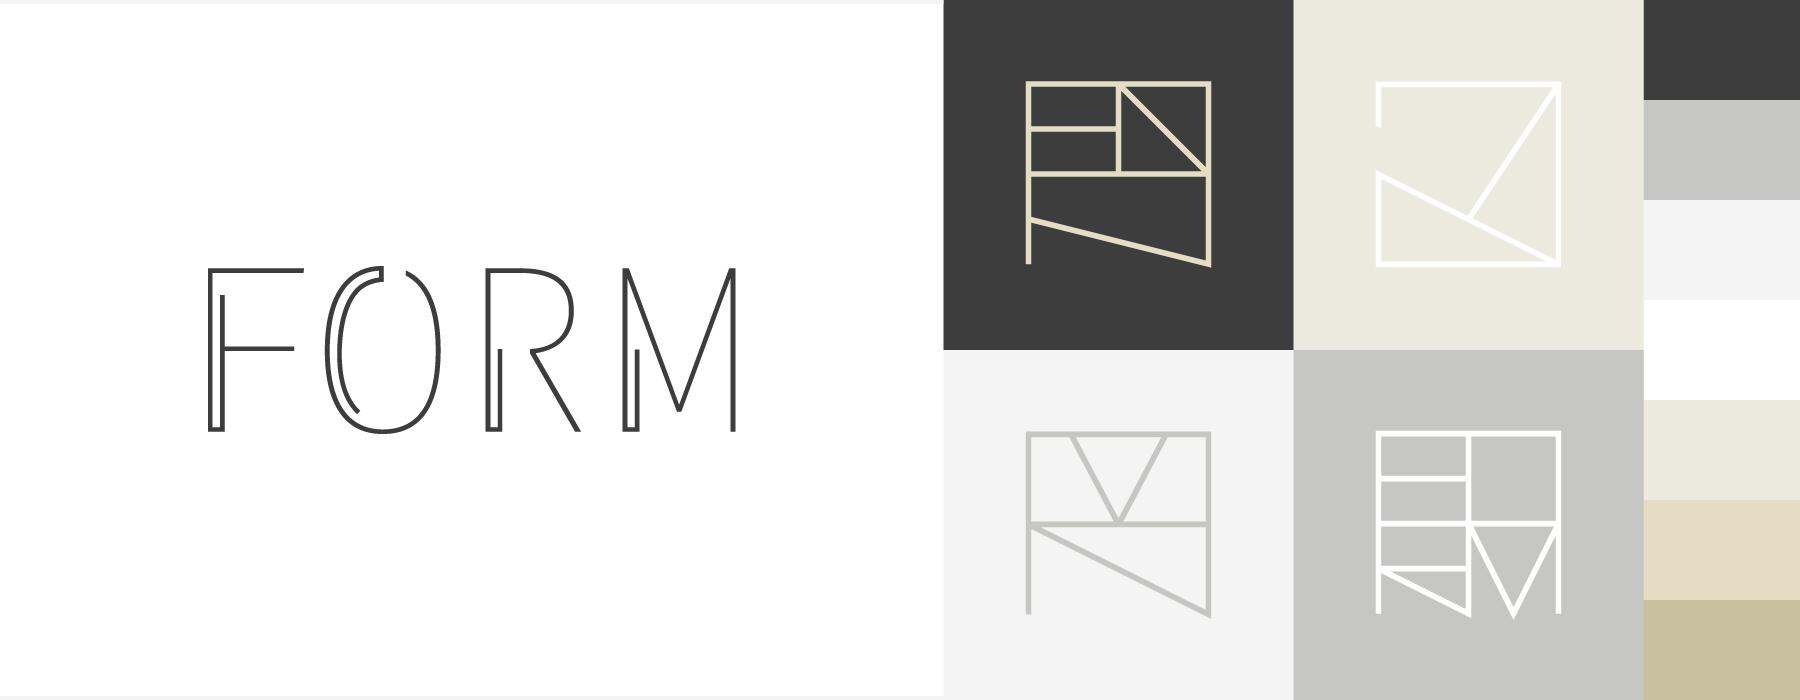 FORM-Brand.jpg